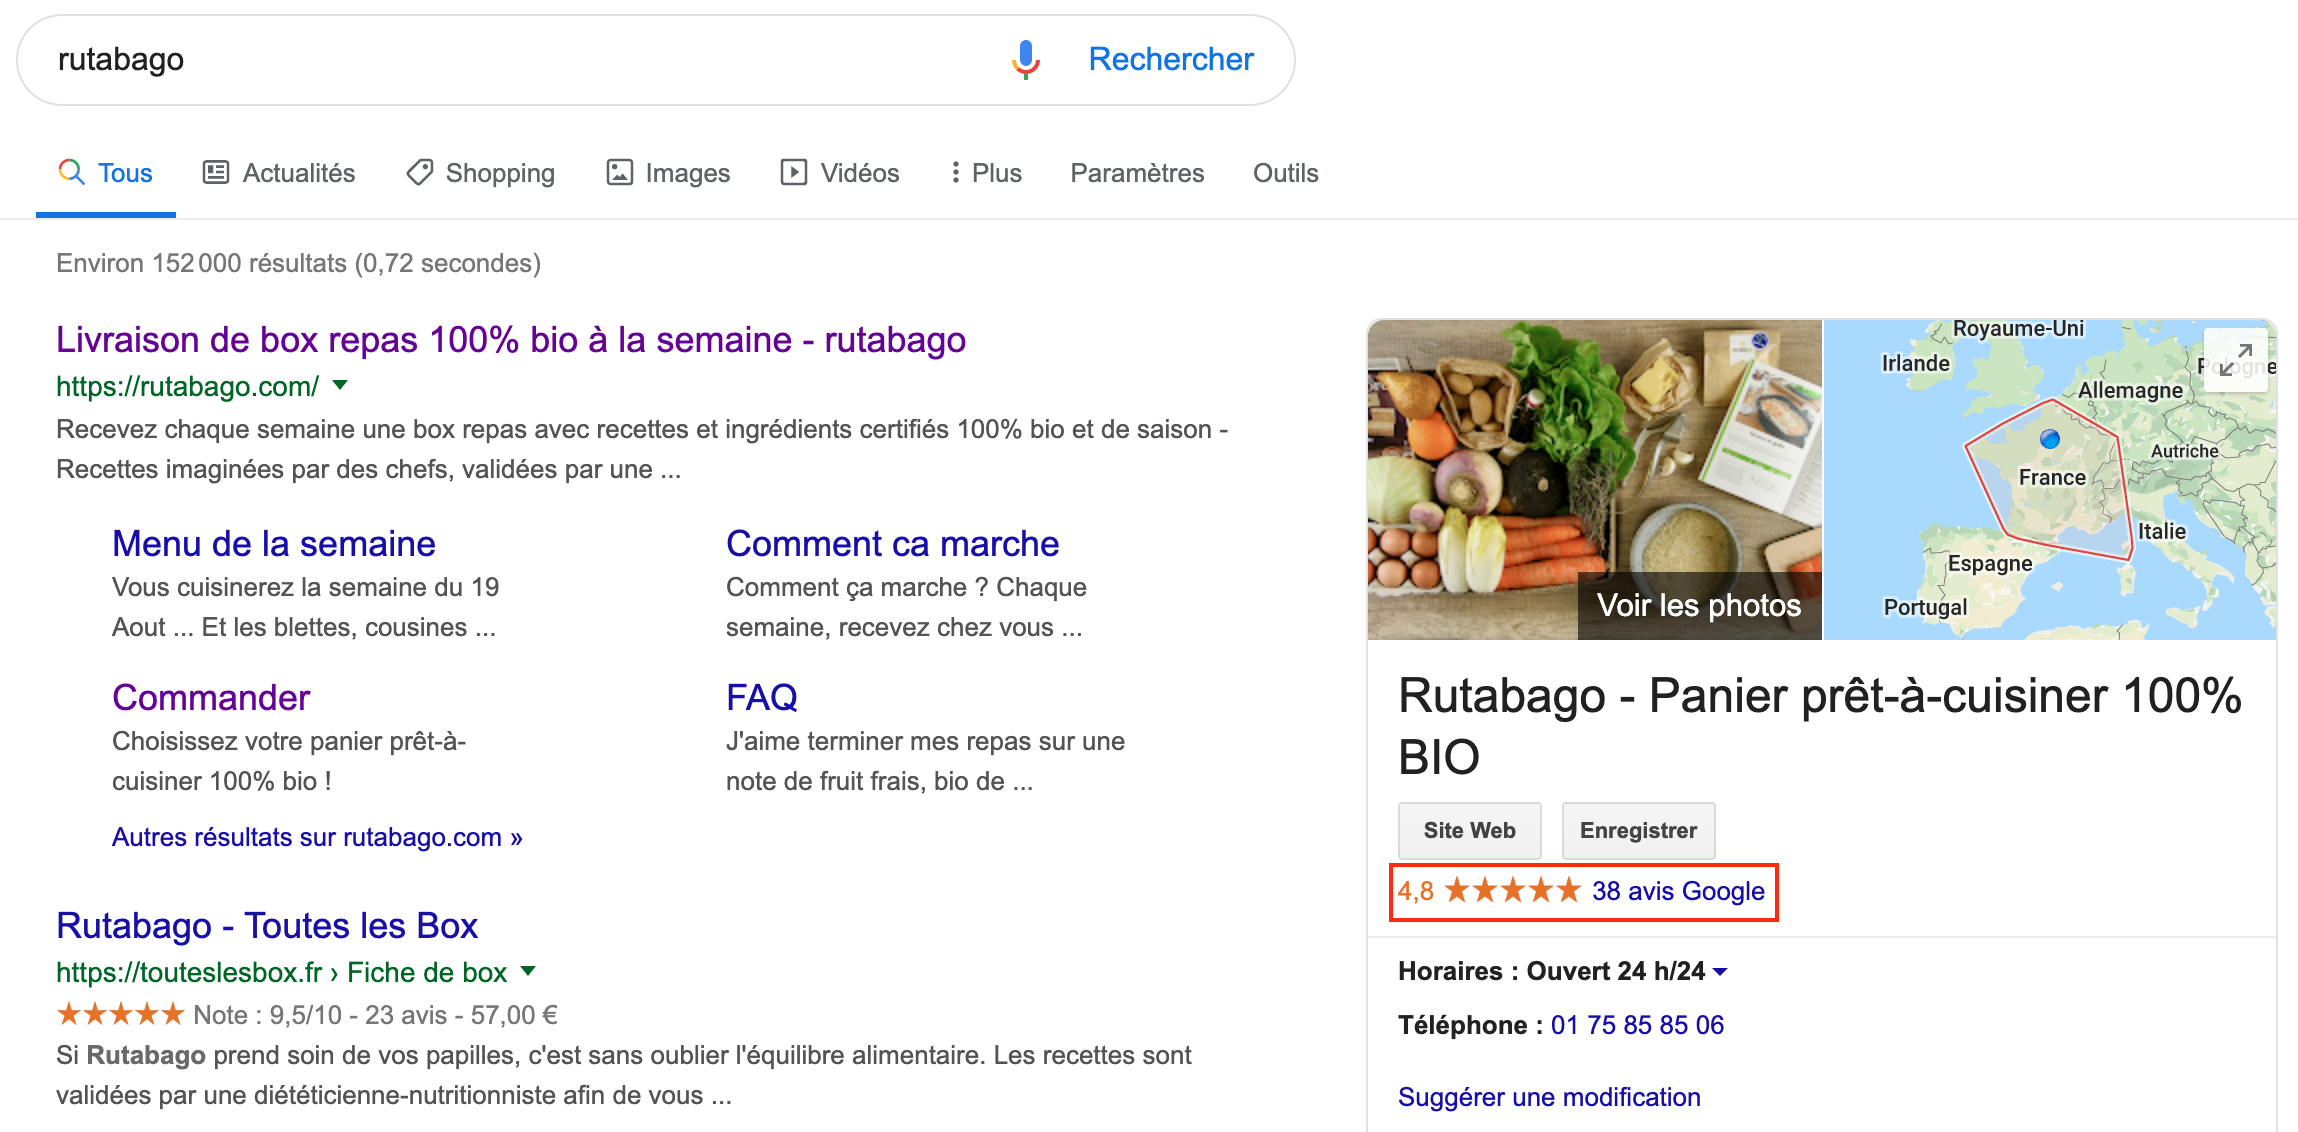 Avis clients Rutabago